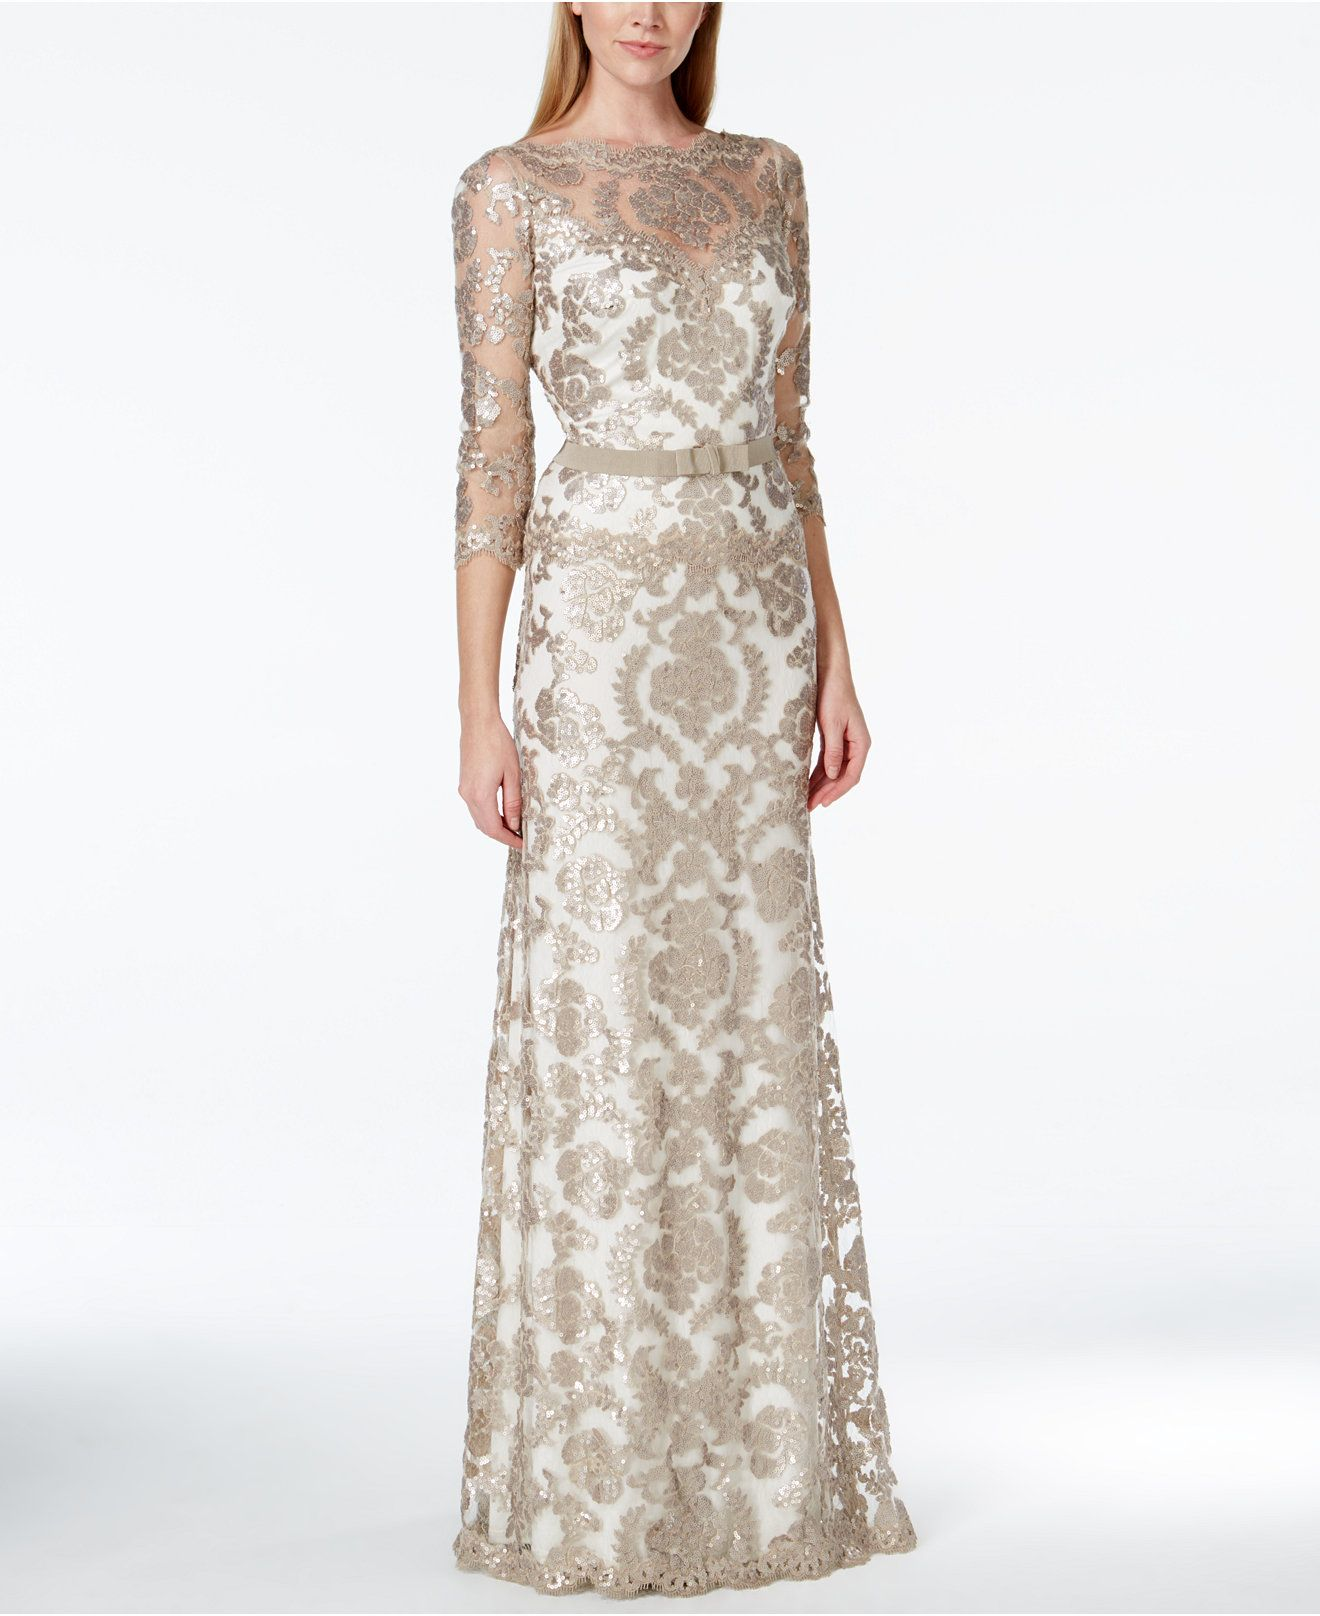 Tadashi Shoji Damask Sequin Lace Bow Gown - Dresses - Women ...